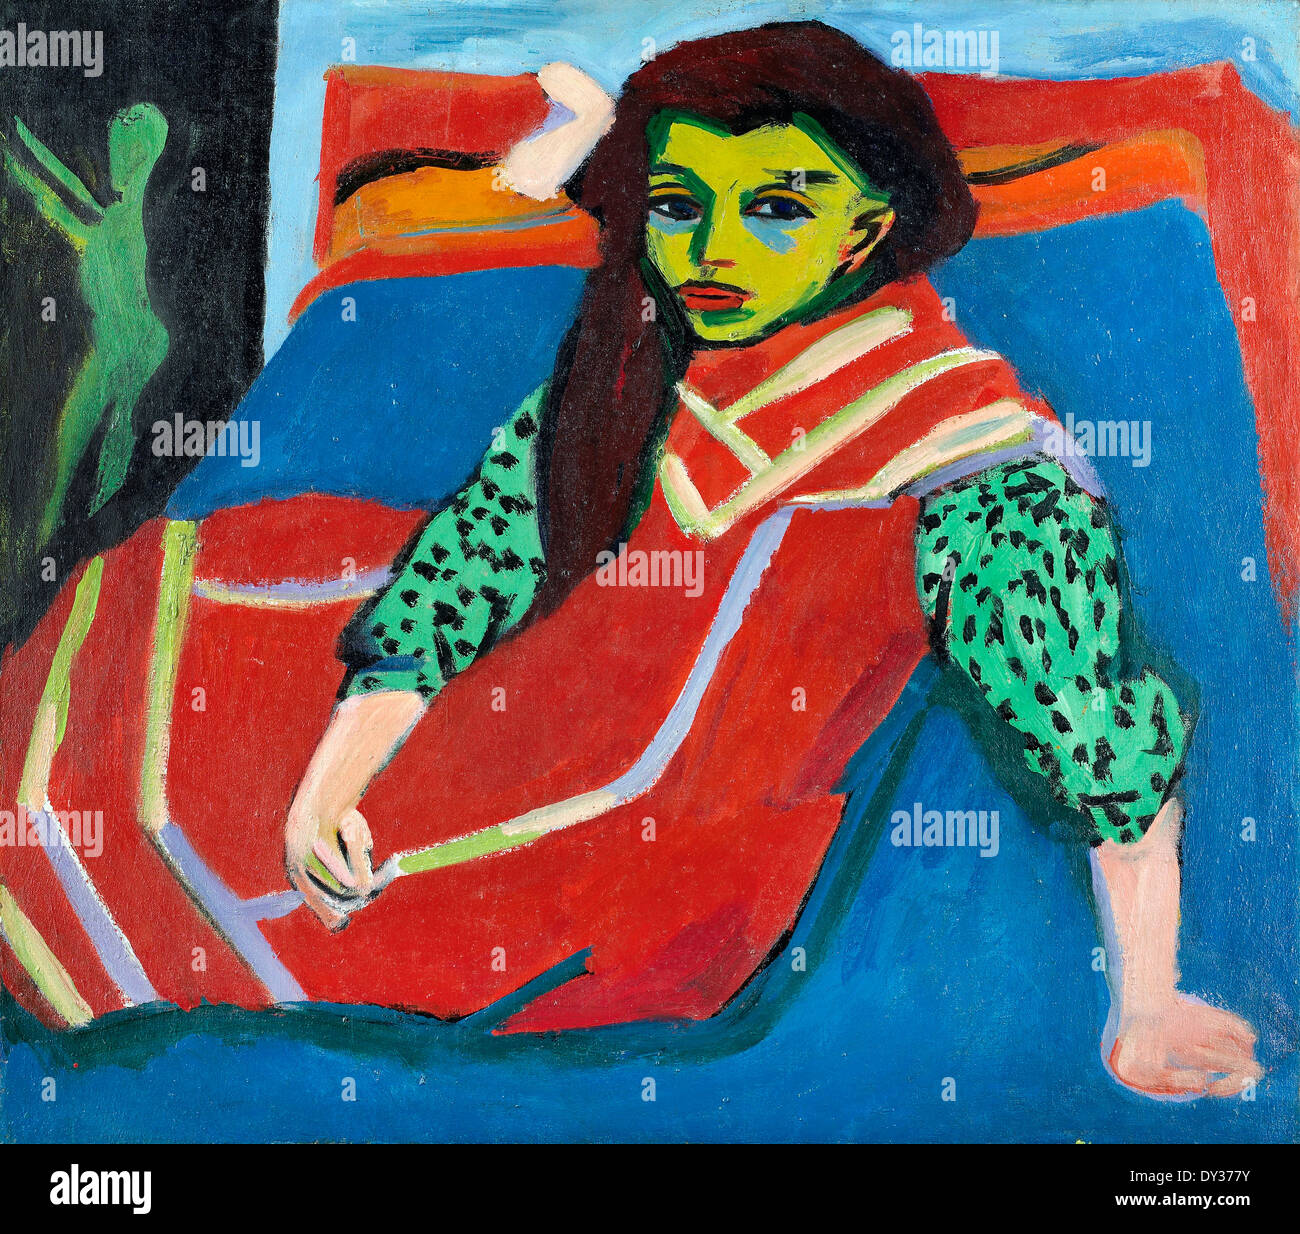 Ernst Ludwig Kirchner, sentado Chica (Franzi Fehrmann) 1910-1920 Óleo sobre lienzo. Minneapolis Institute of Arts, ESTADOS UNIDOS. Foto de stock